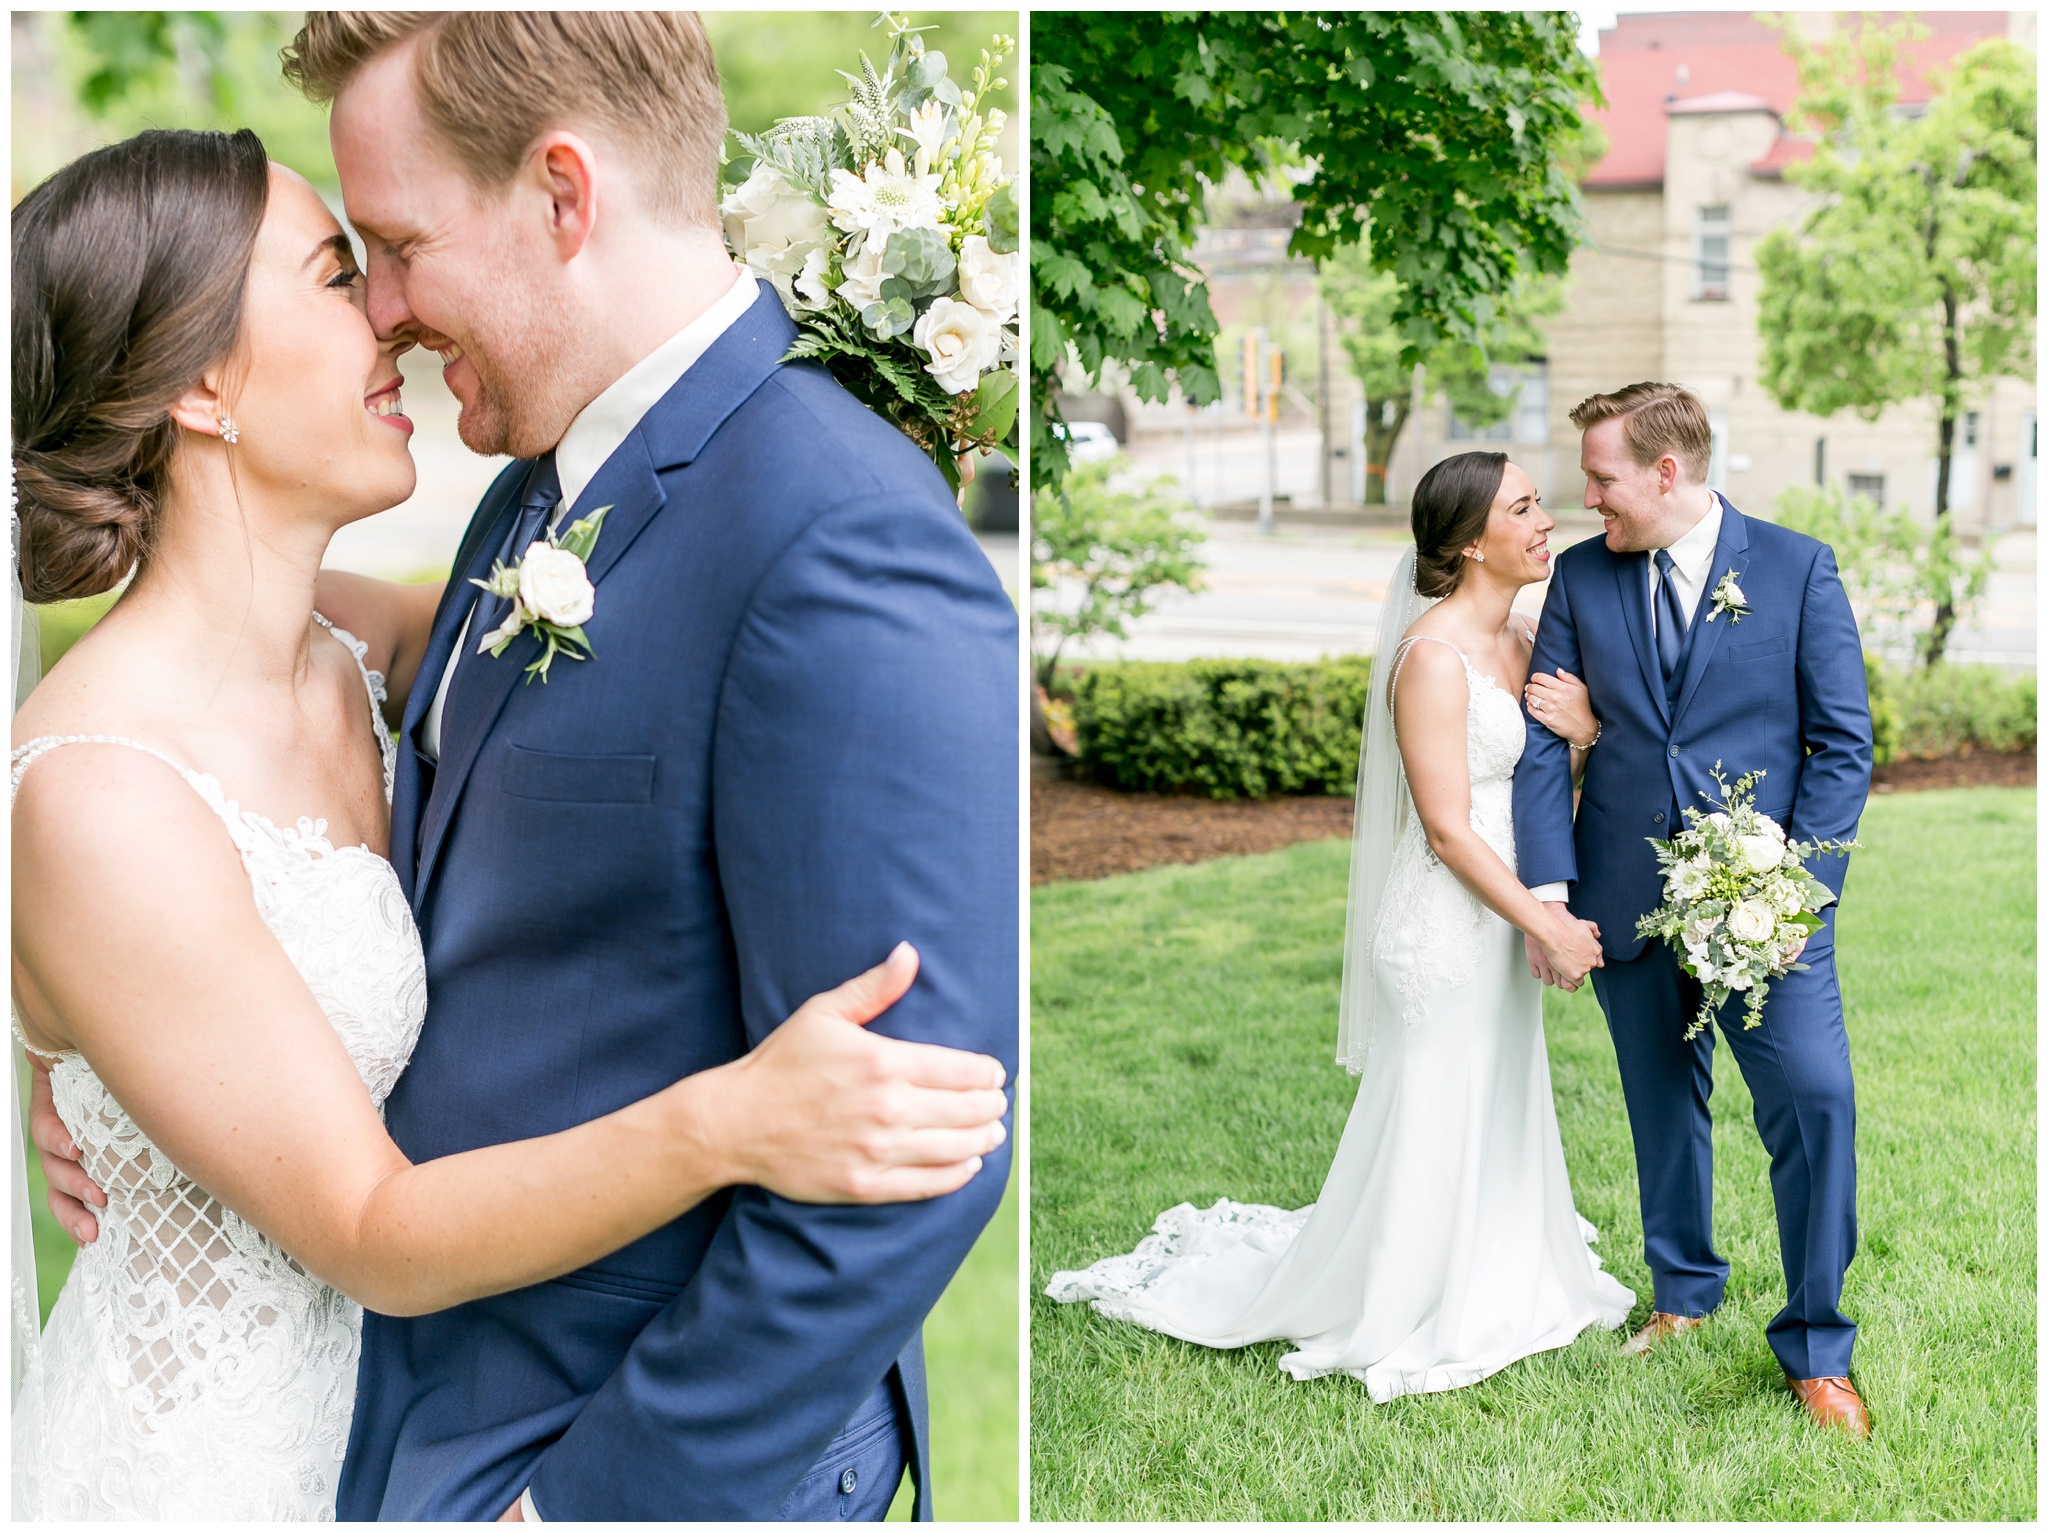 Union_south_Wedding_Madison_Wisconsin_Caynay_Photo_3646.jpg